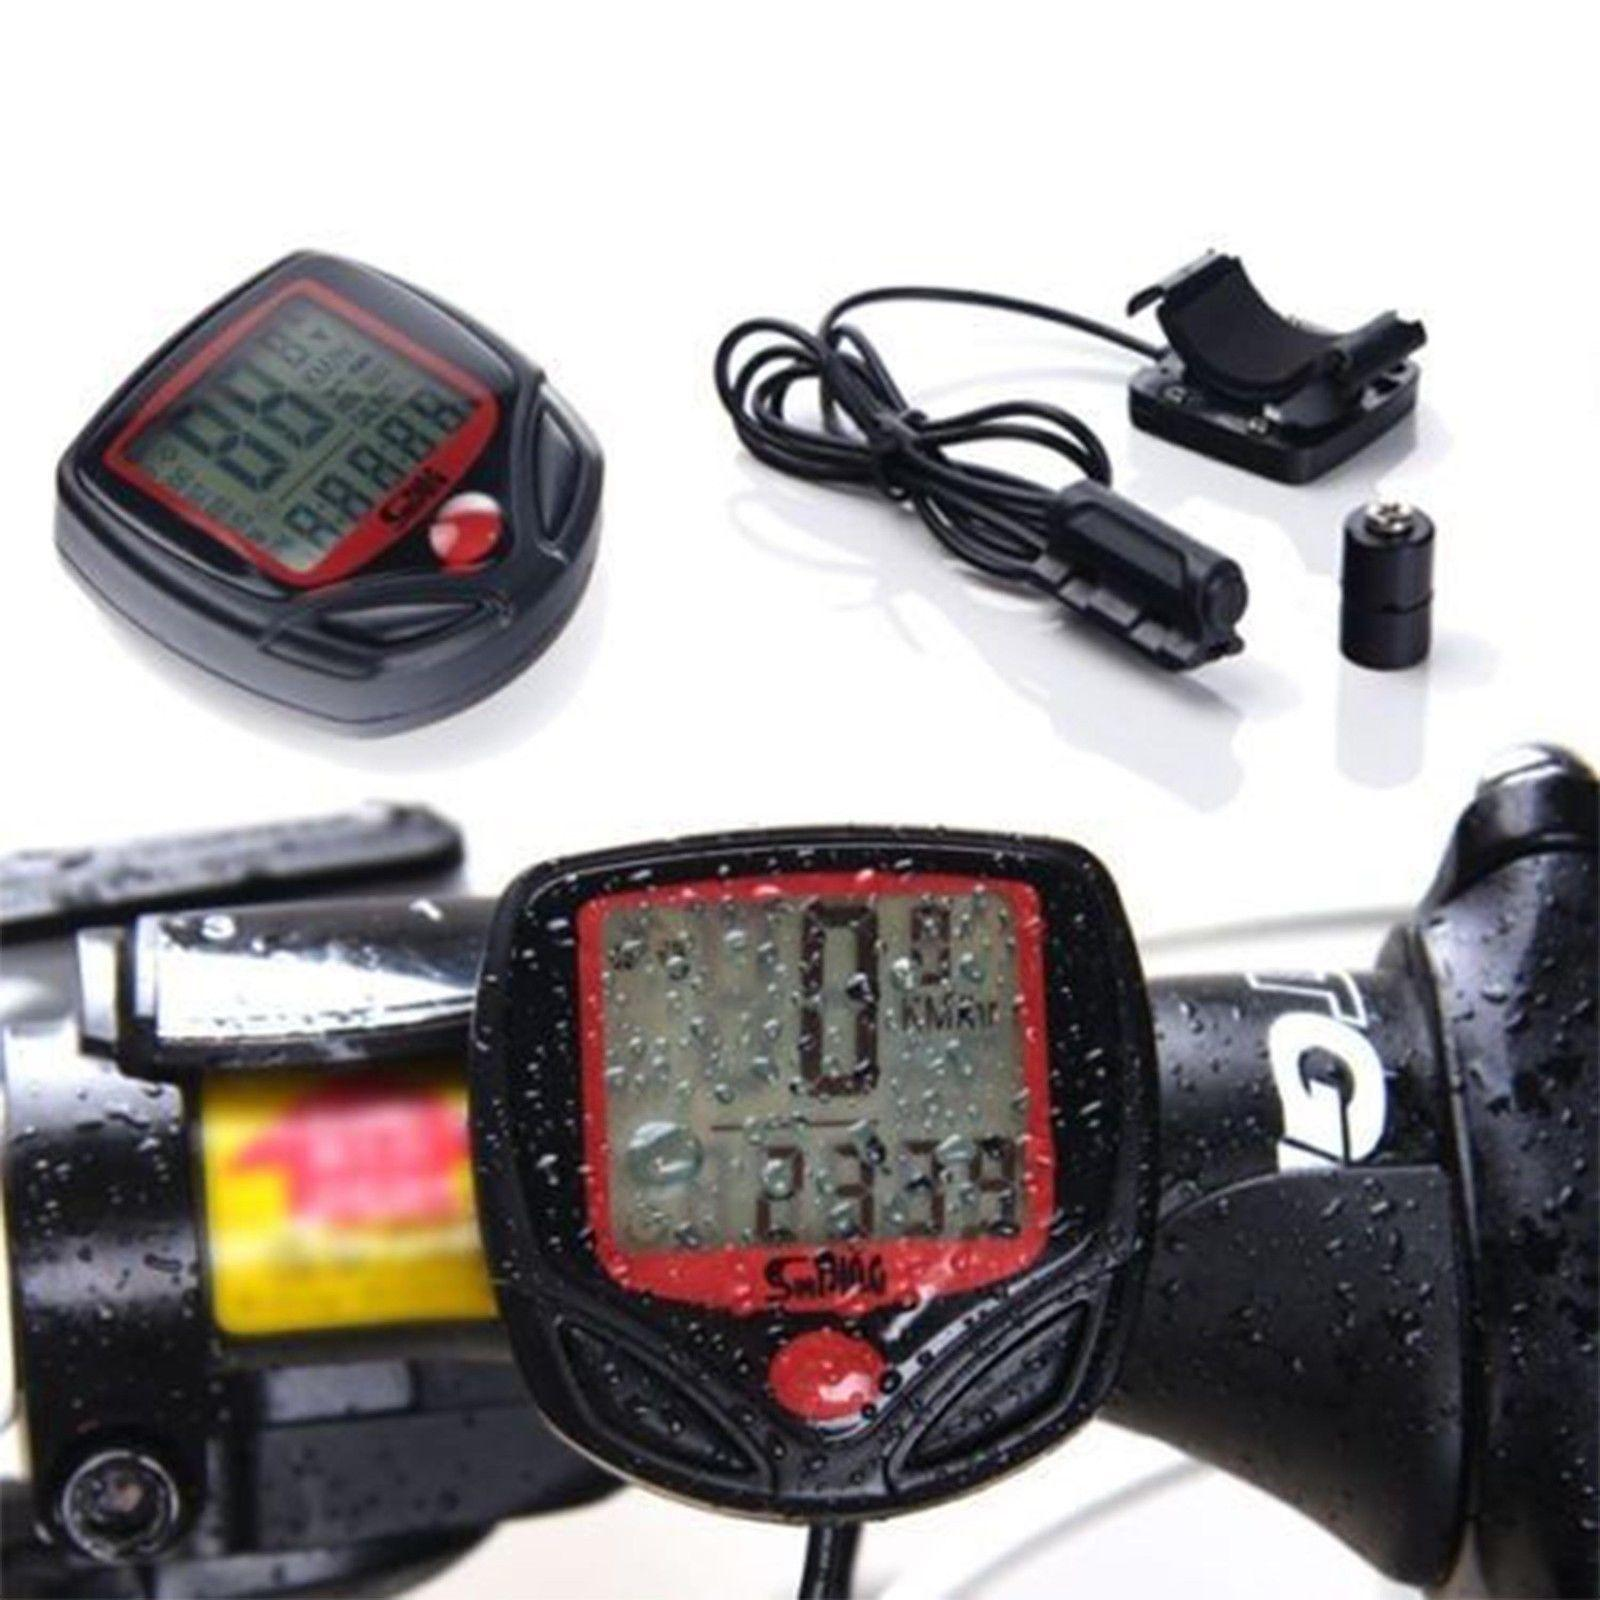 Cuentakilometros Velocimetro De Bicicleta / Bici 14 Funciones